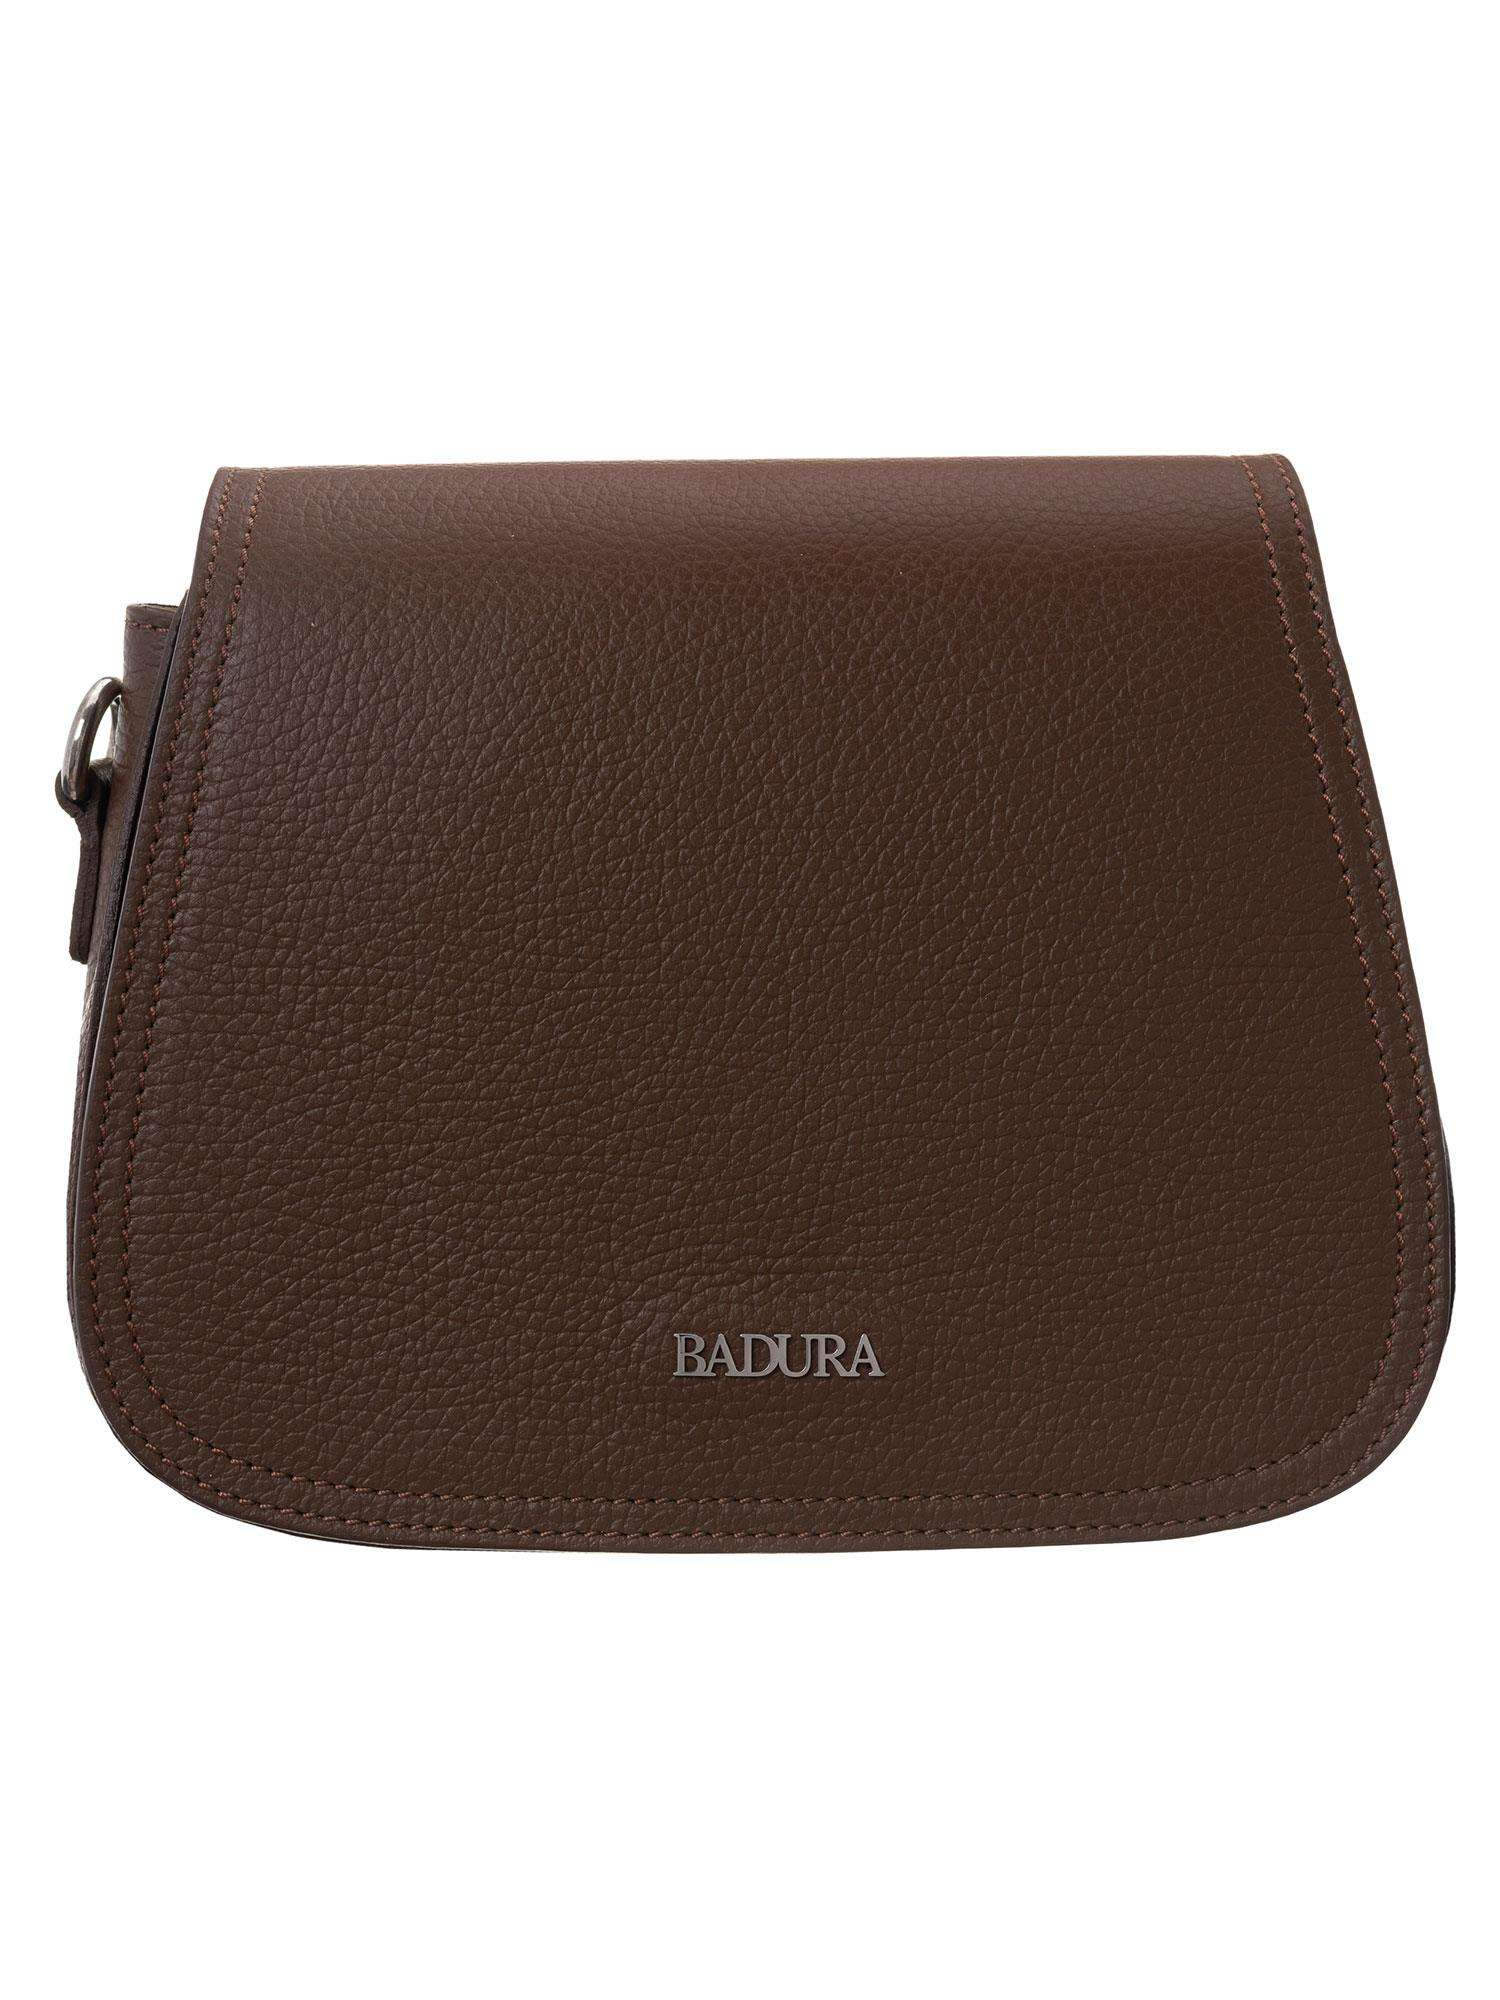 Hnedá kožená kabelka Badura one size